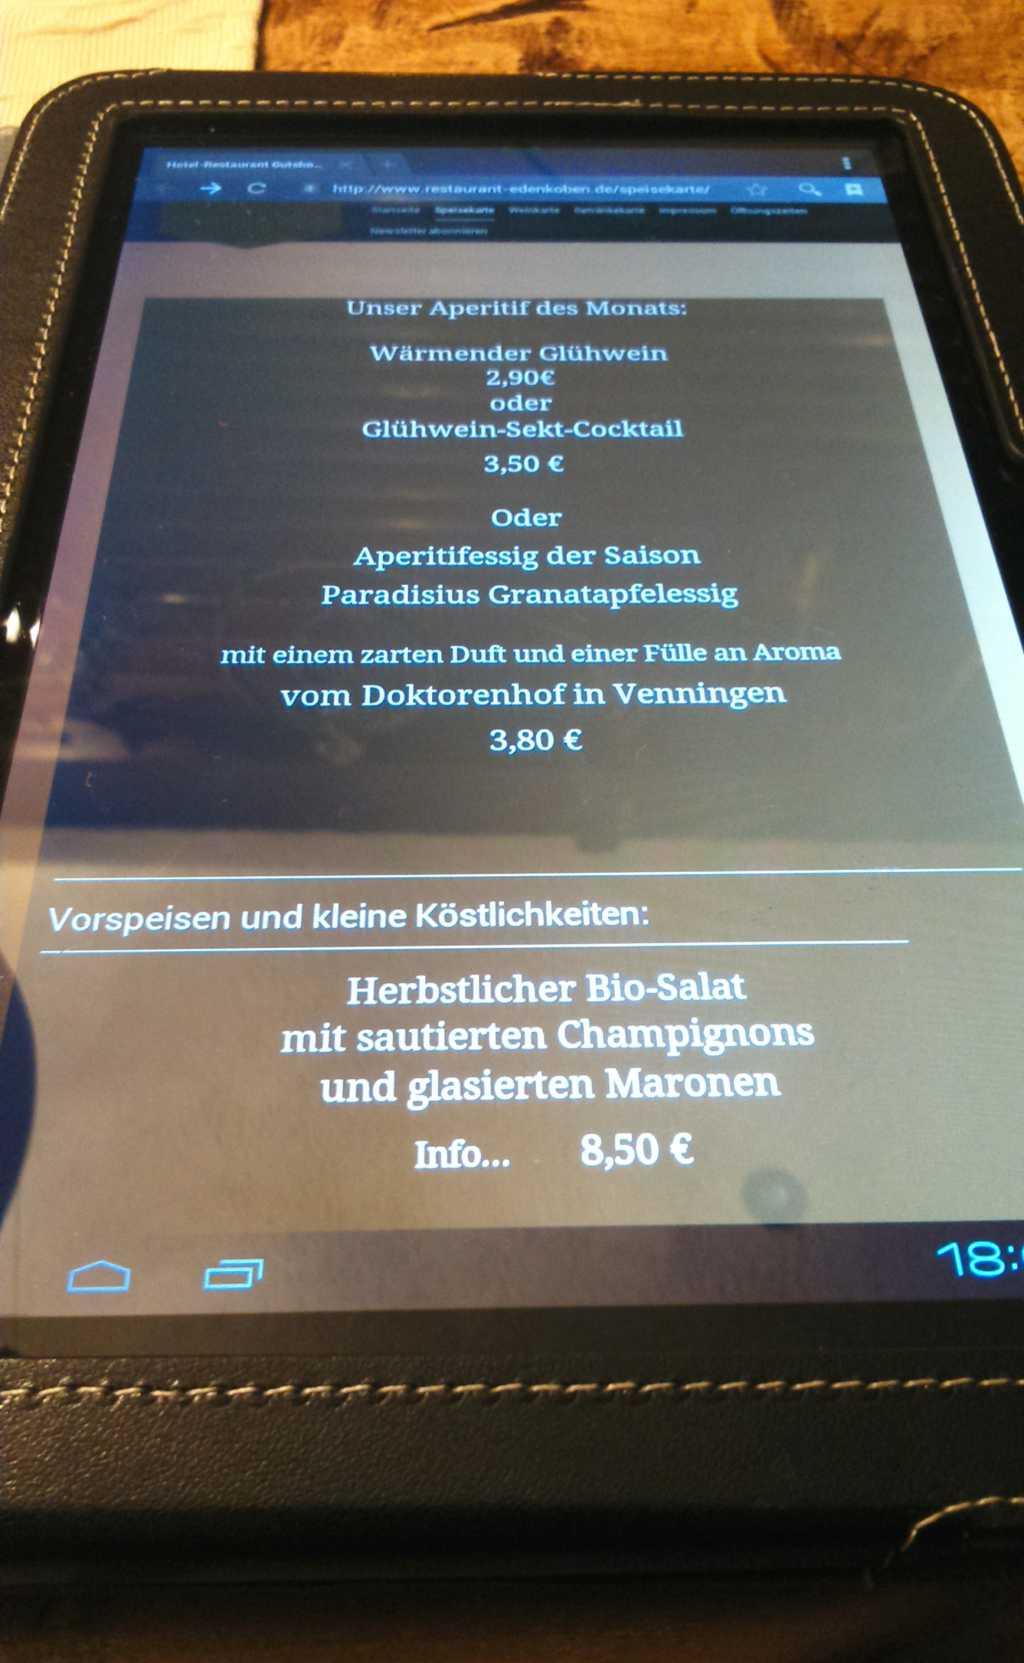 Gutshof Ziegelhütte - IPad Speisekarte